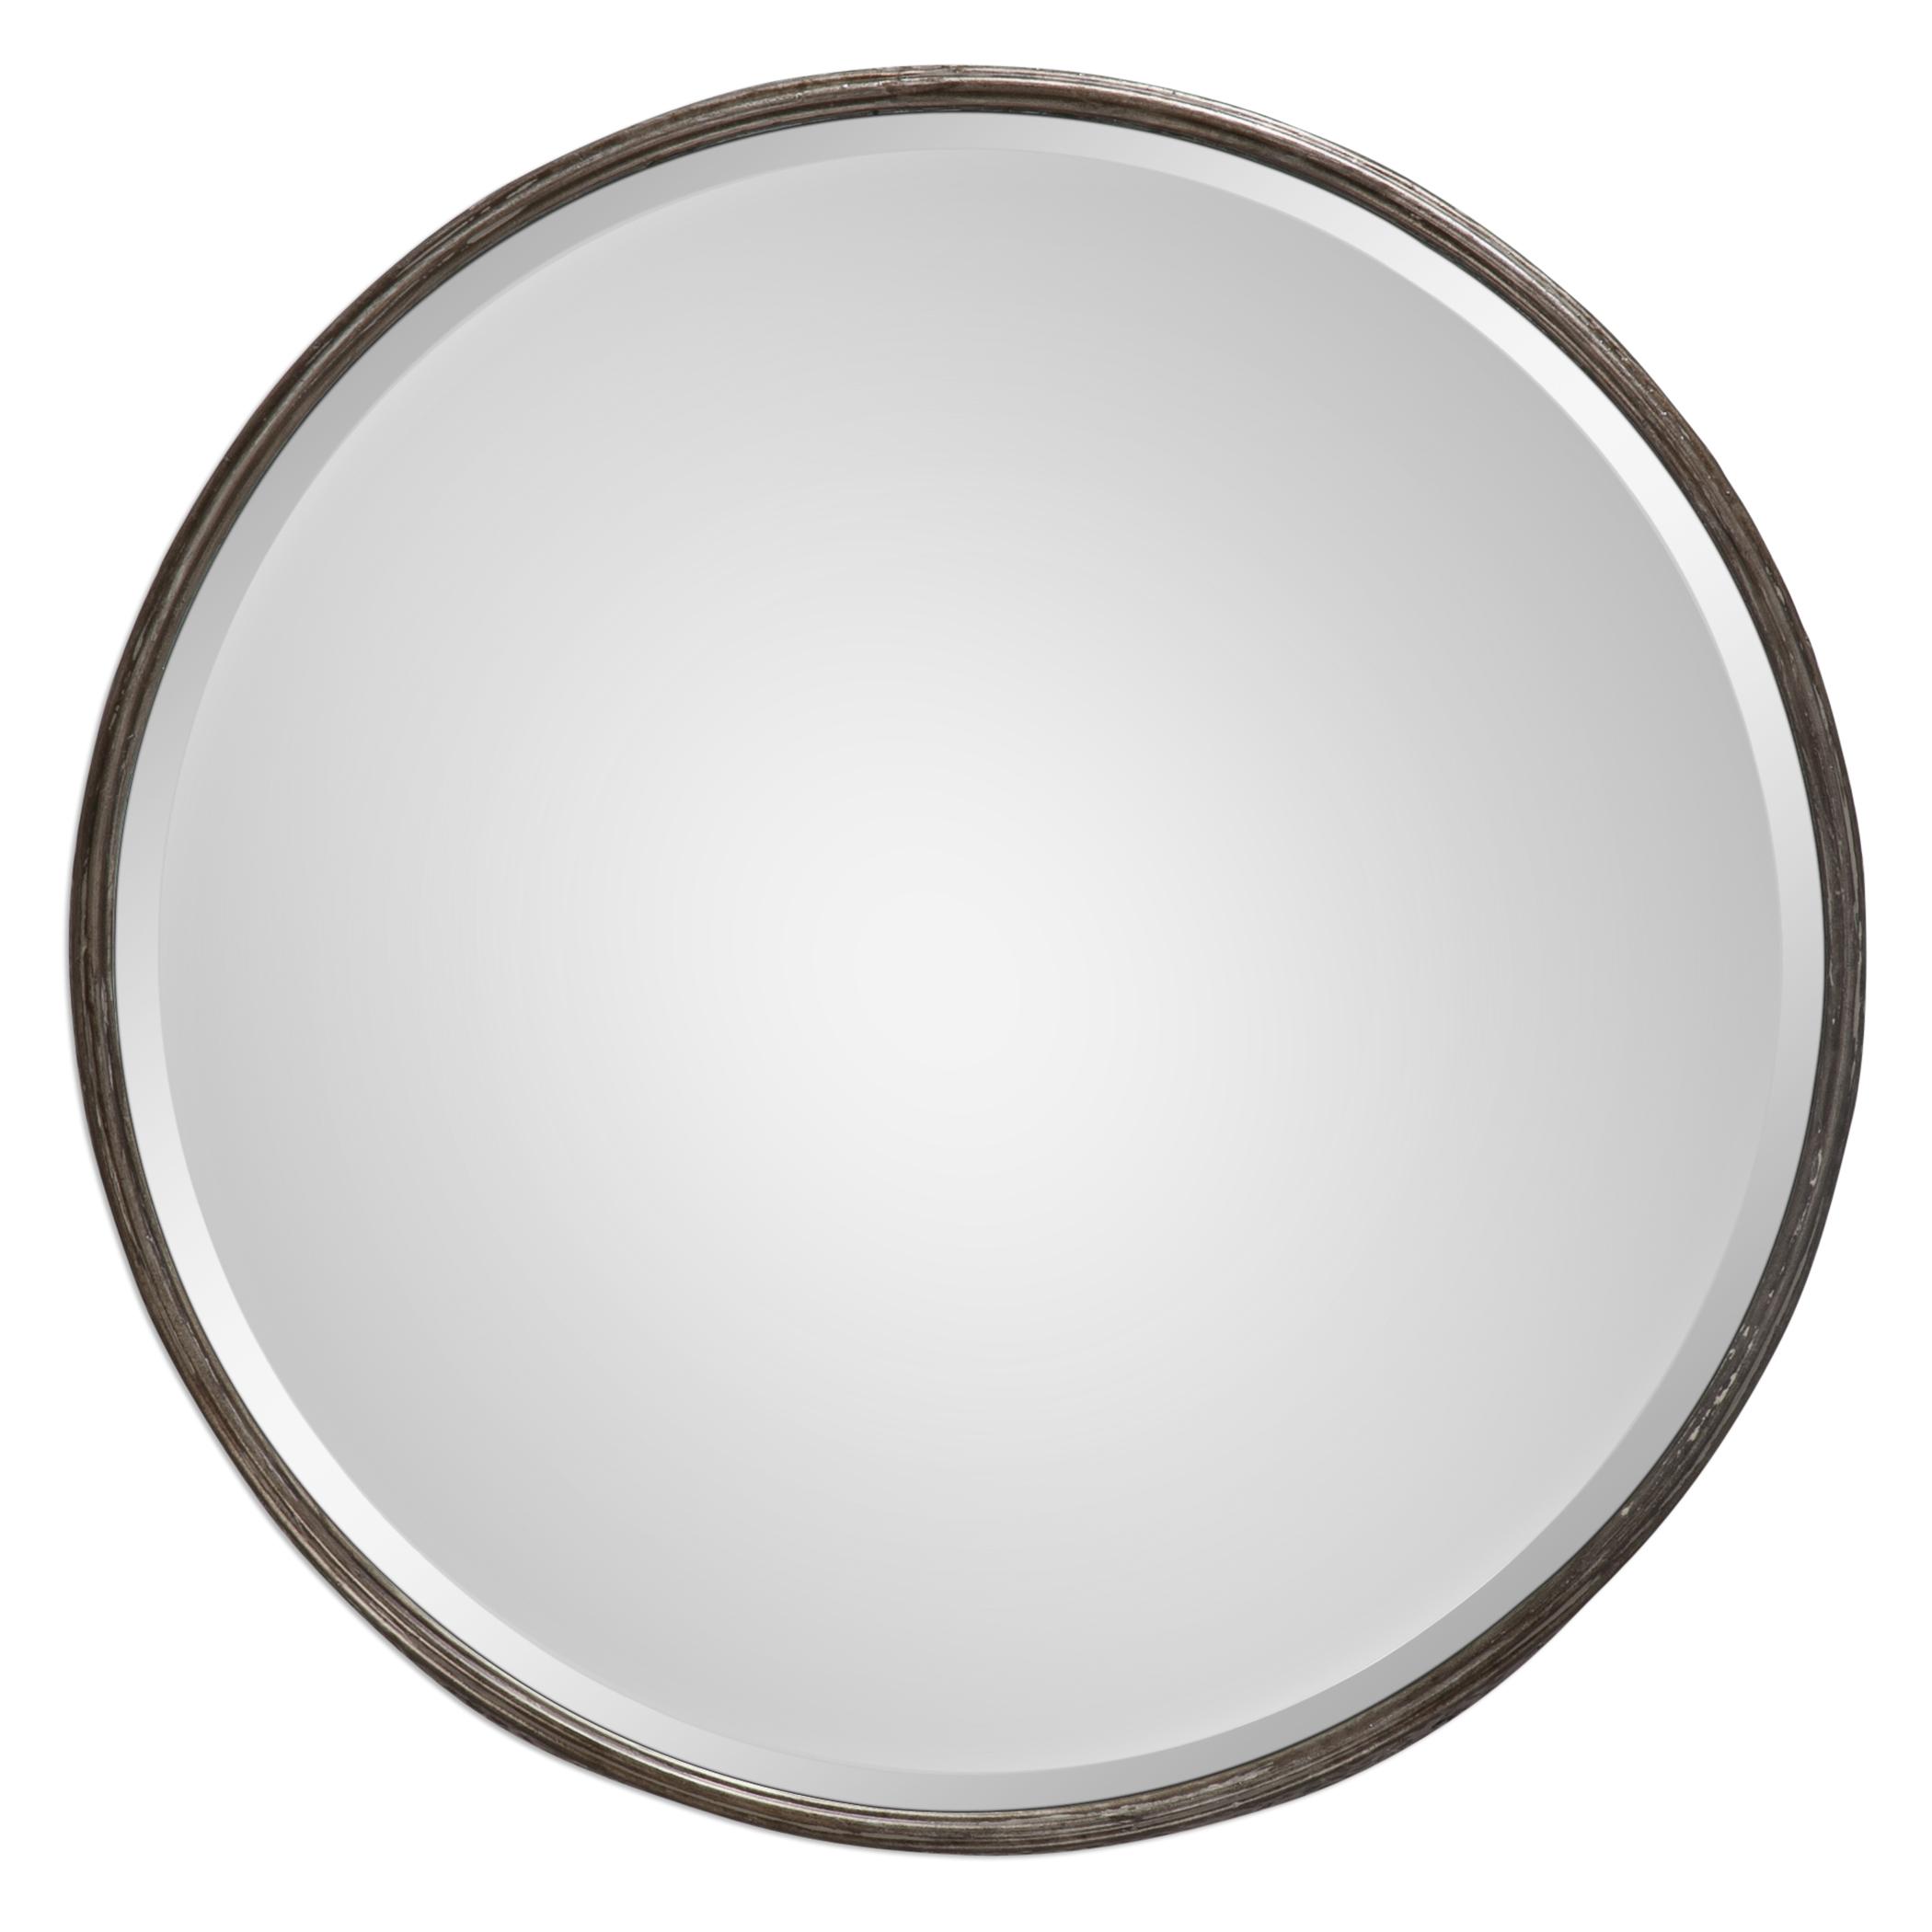 Uttermost Mirrors Nova Round Metal Mirror - Item Number: 09034